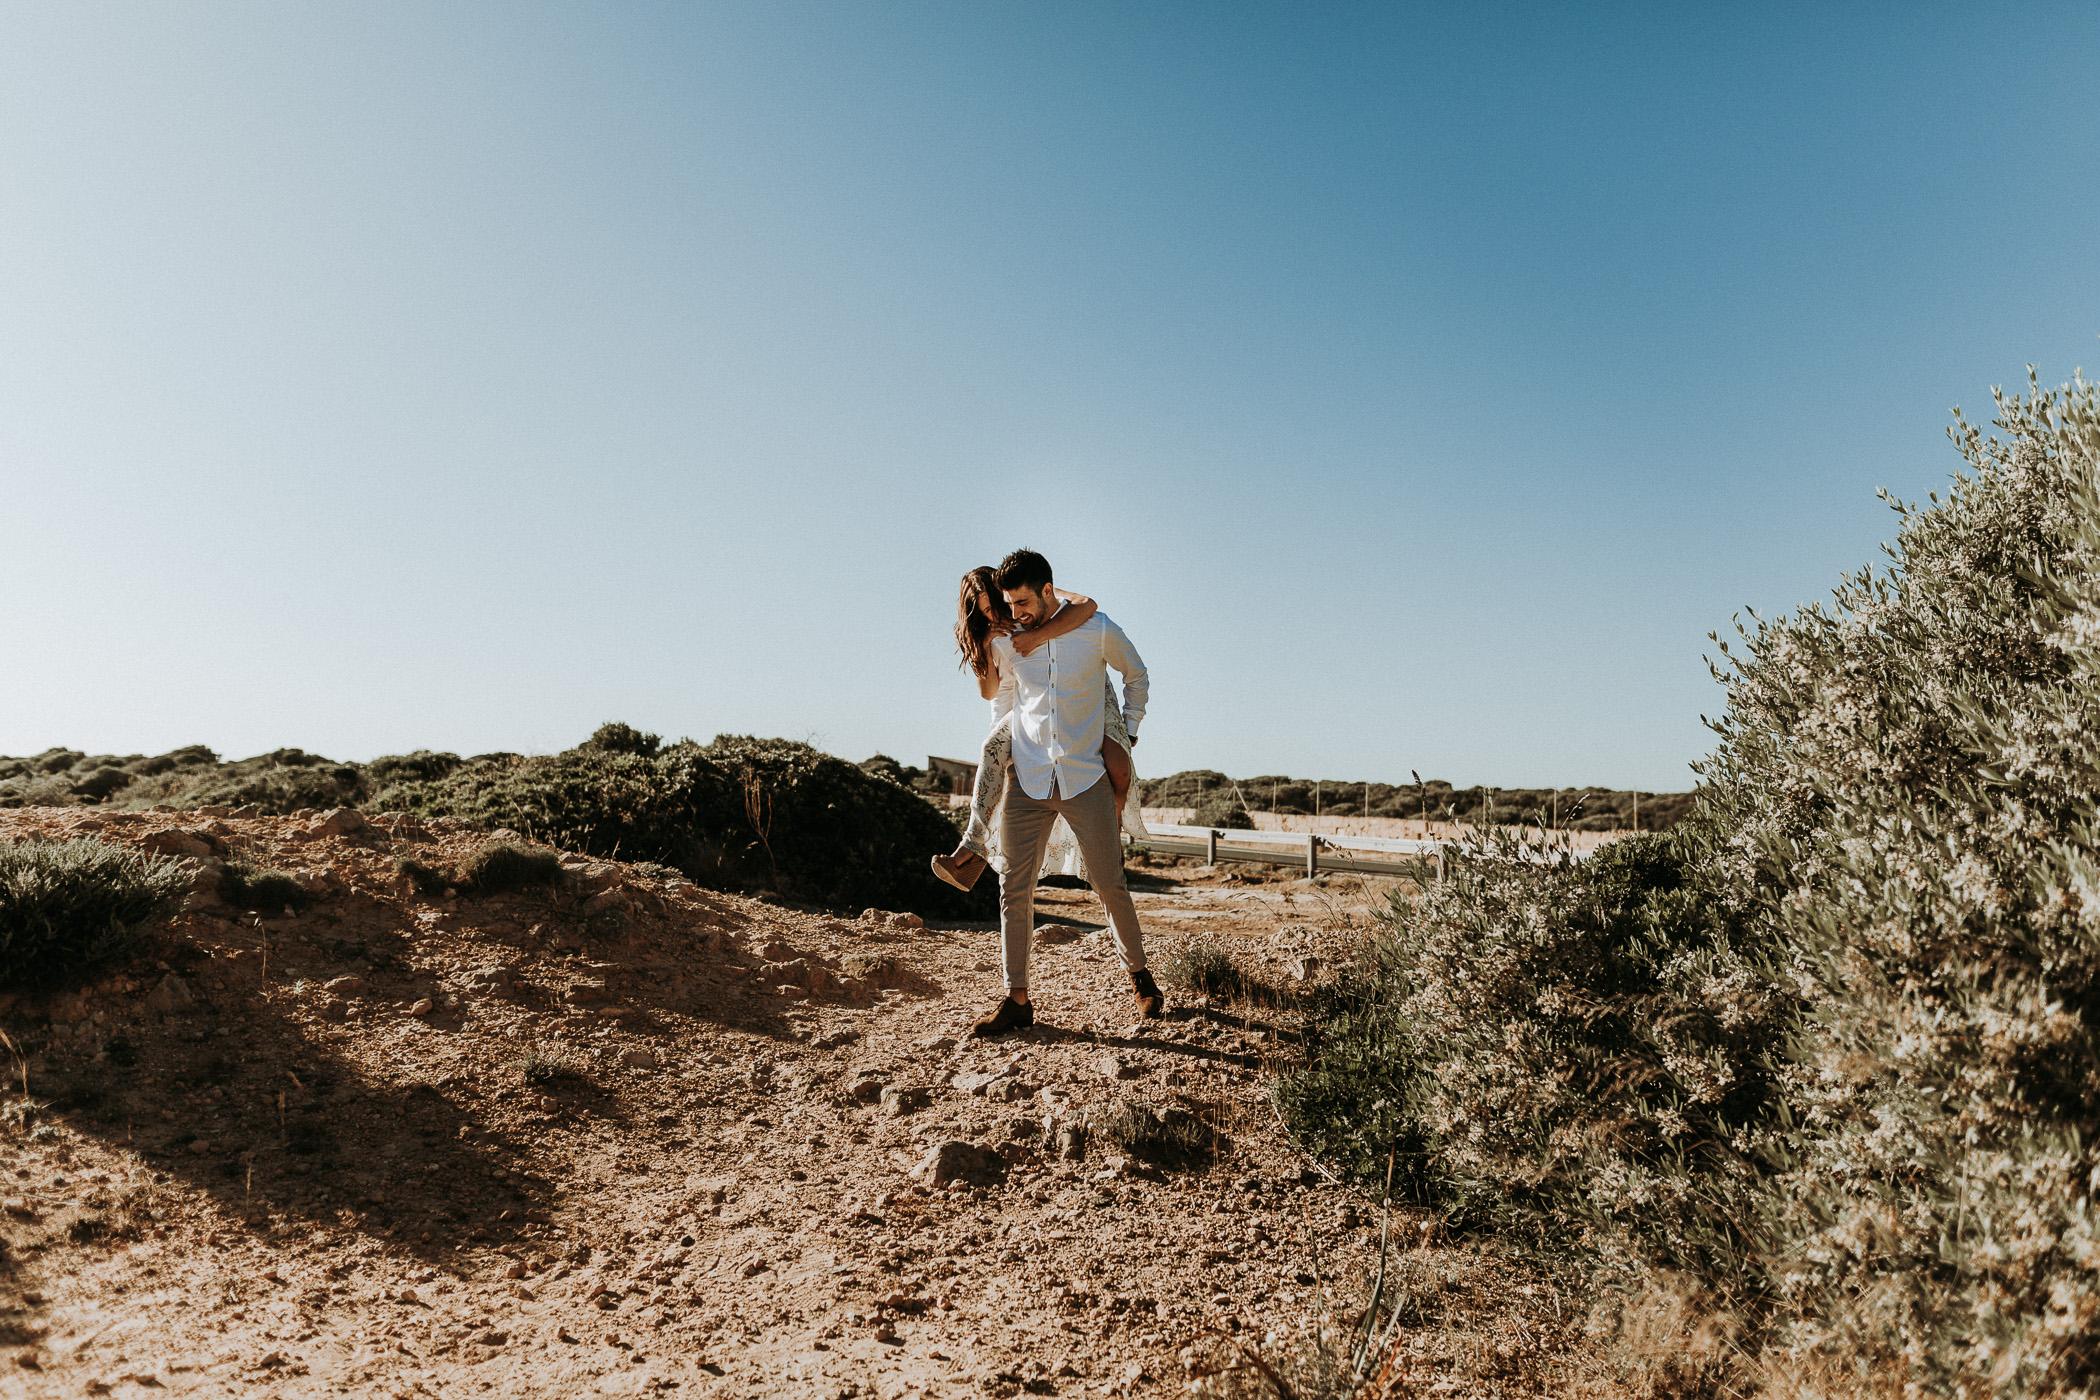 DanielaMarquardtPhotography_wedding_elopement_mallorca_spain_calapi_palma_lauraandtoni_152